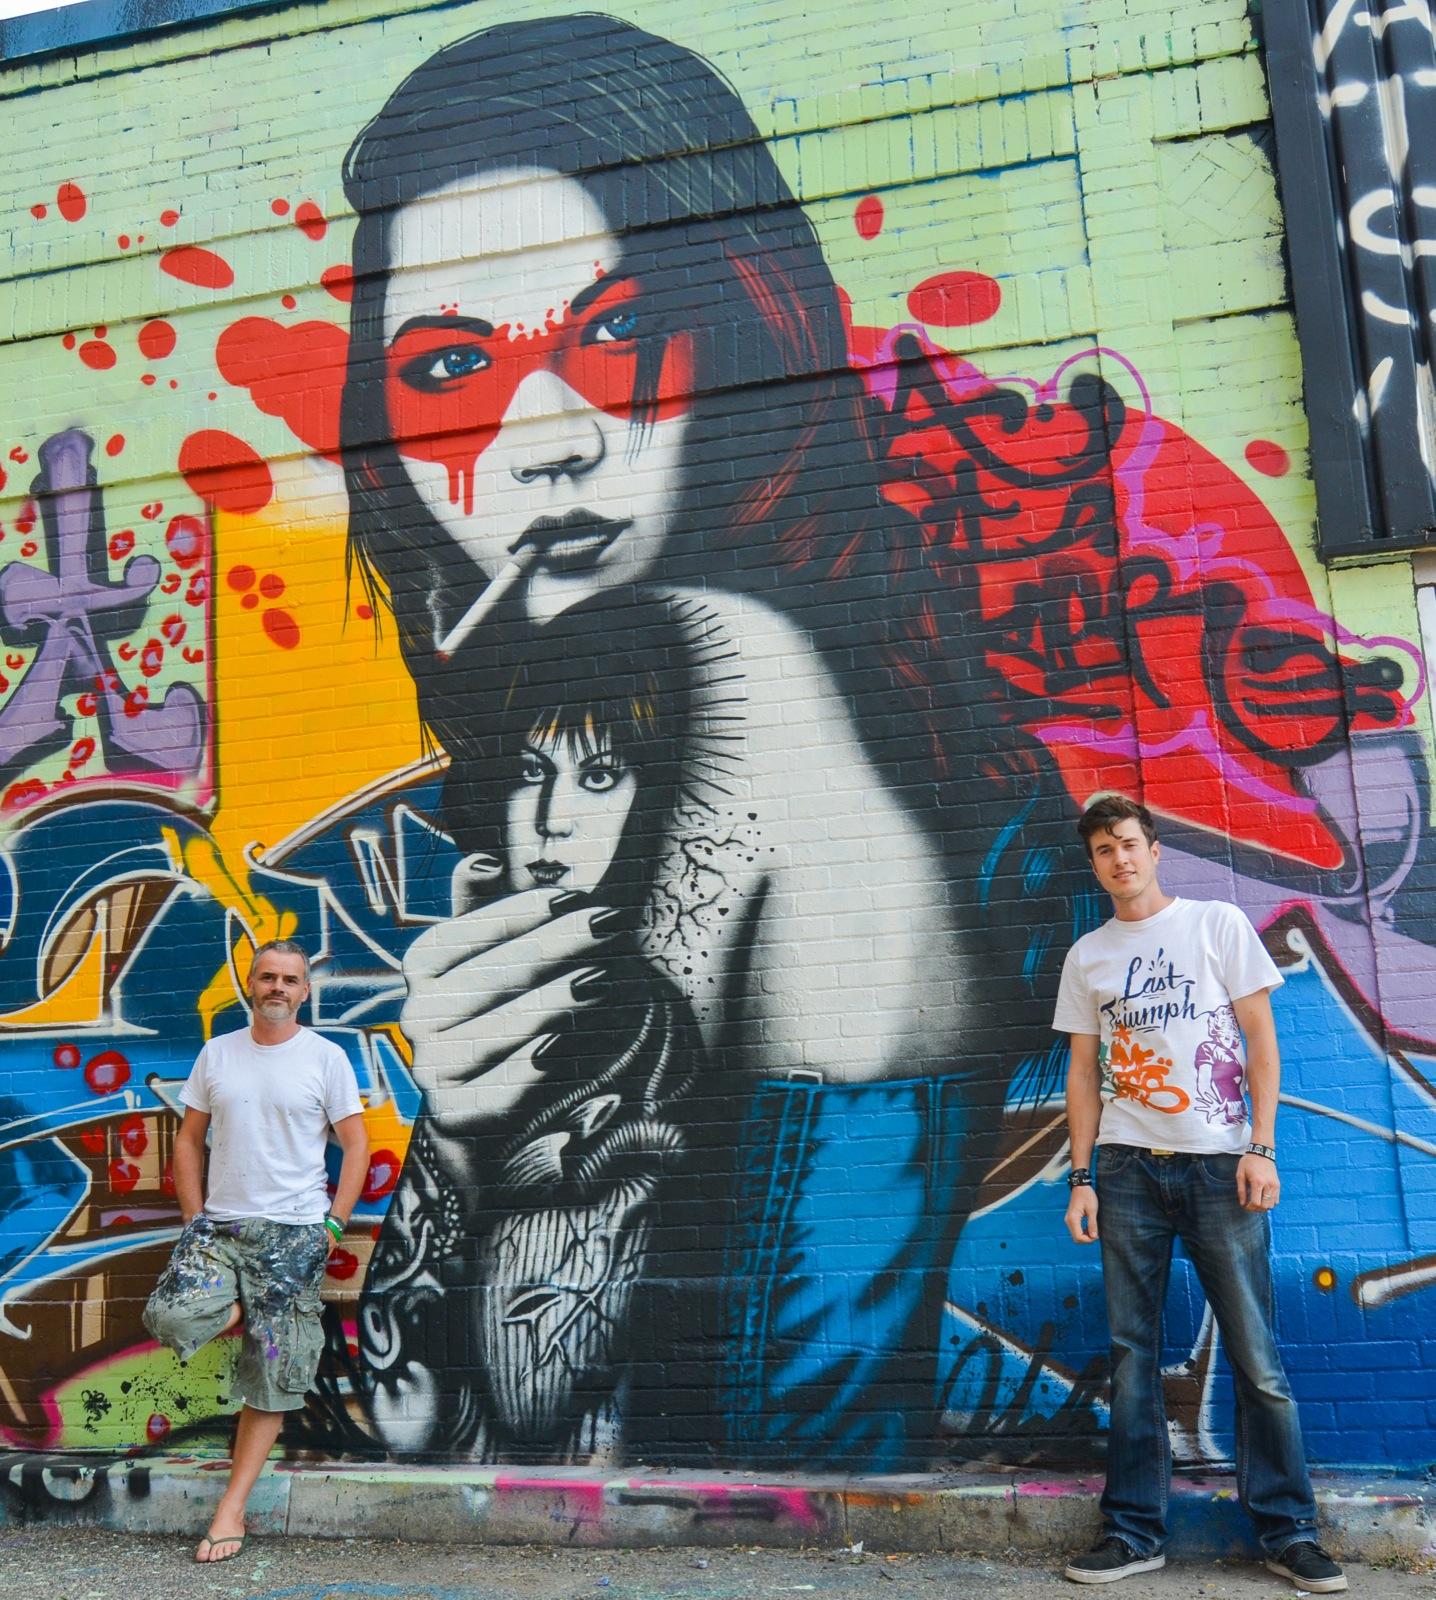 Minneapolis Painters: Fin DAC New Mural In Minneapolis, USA